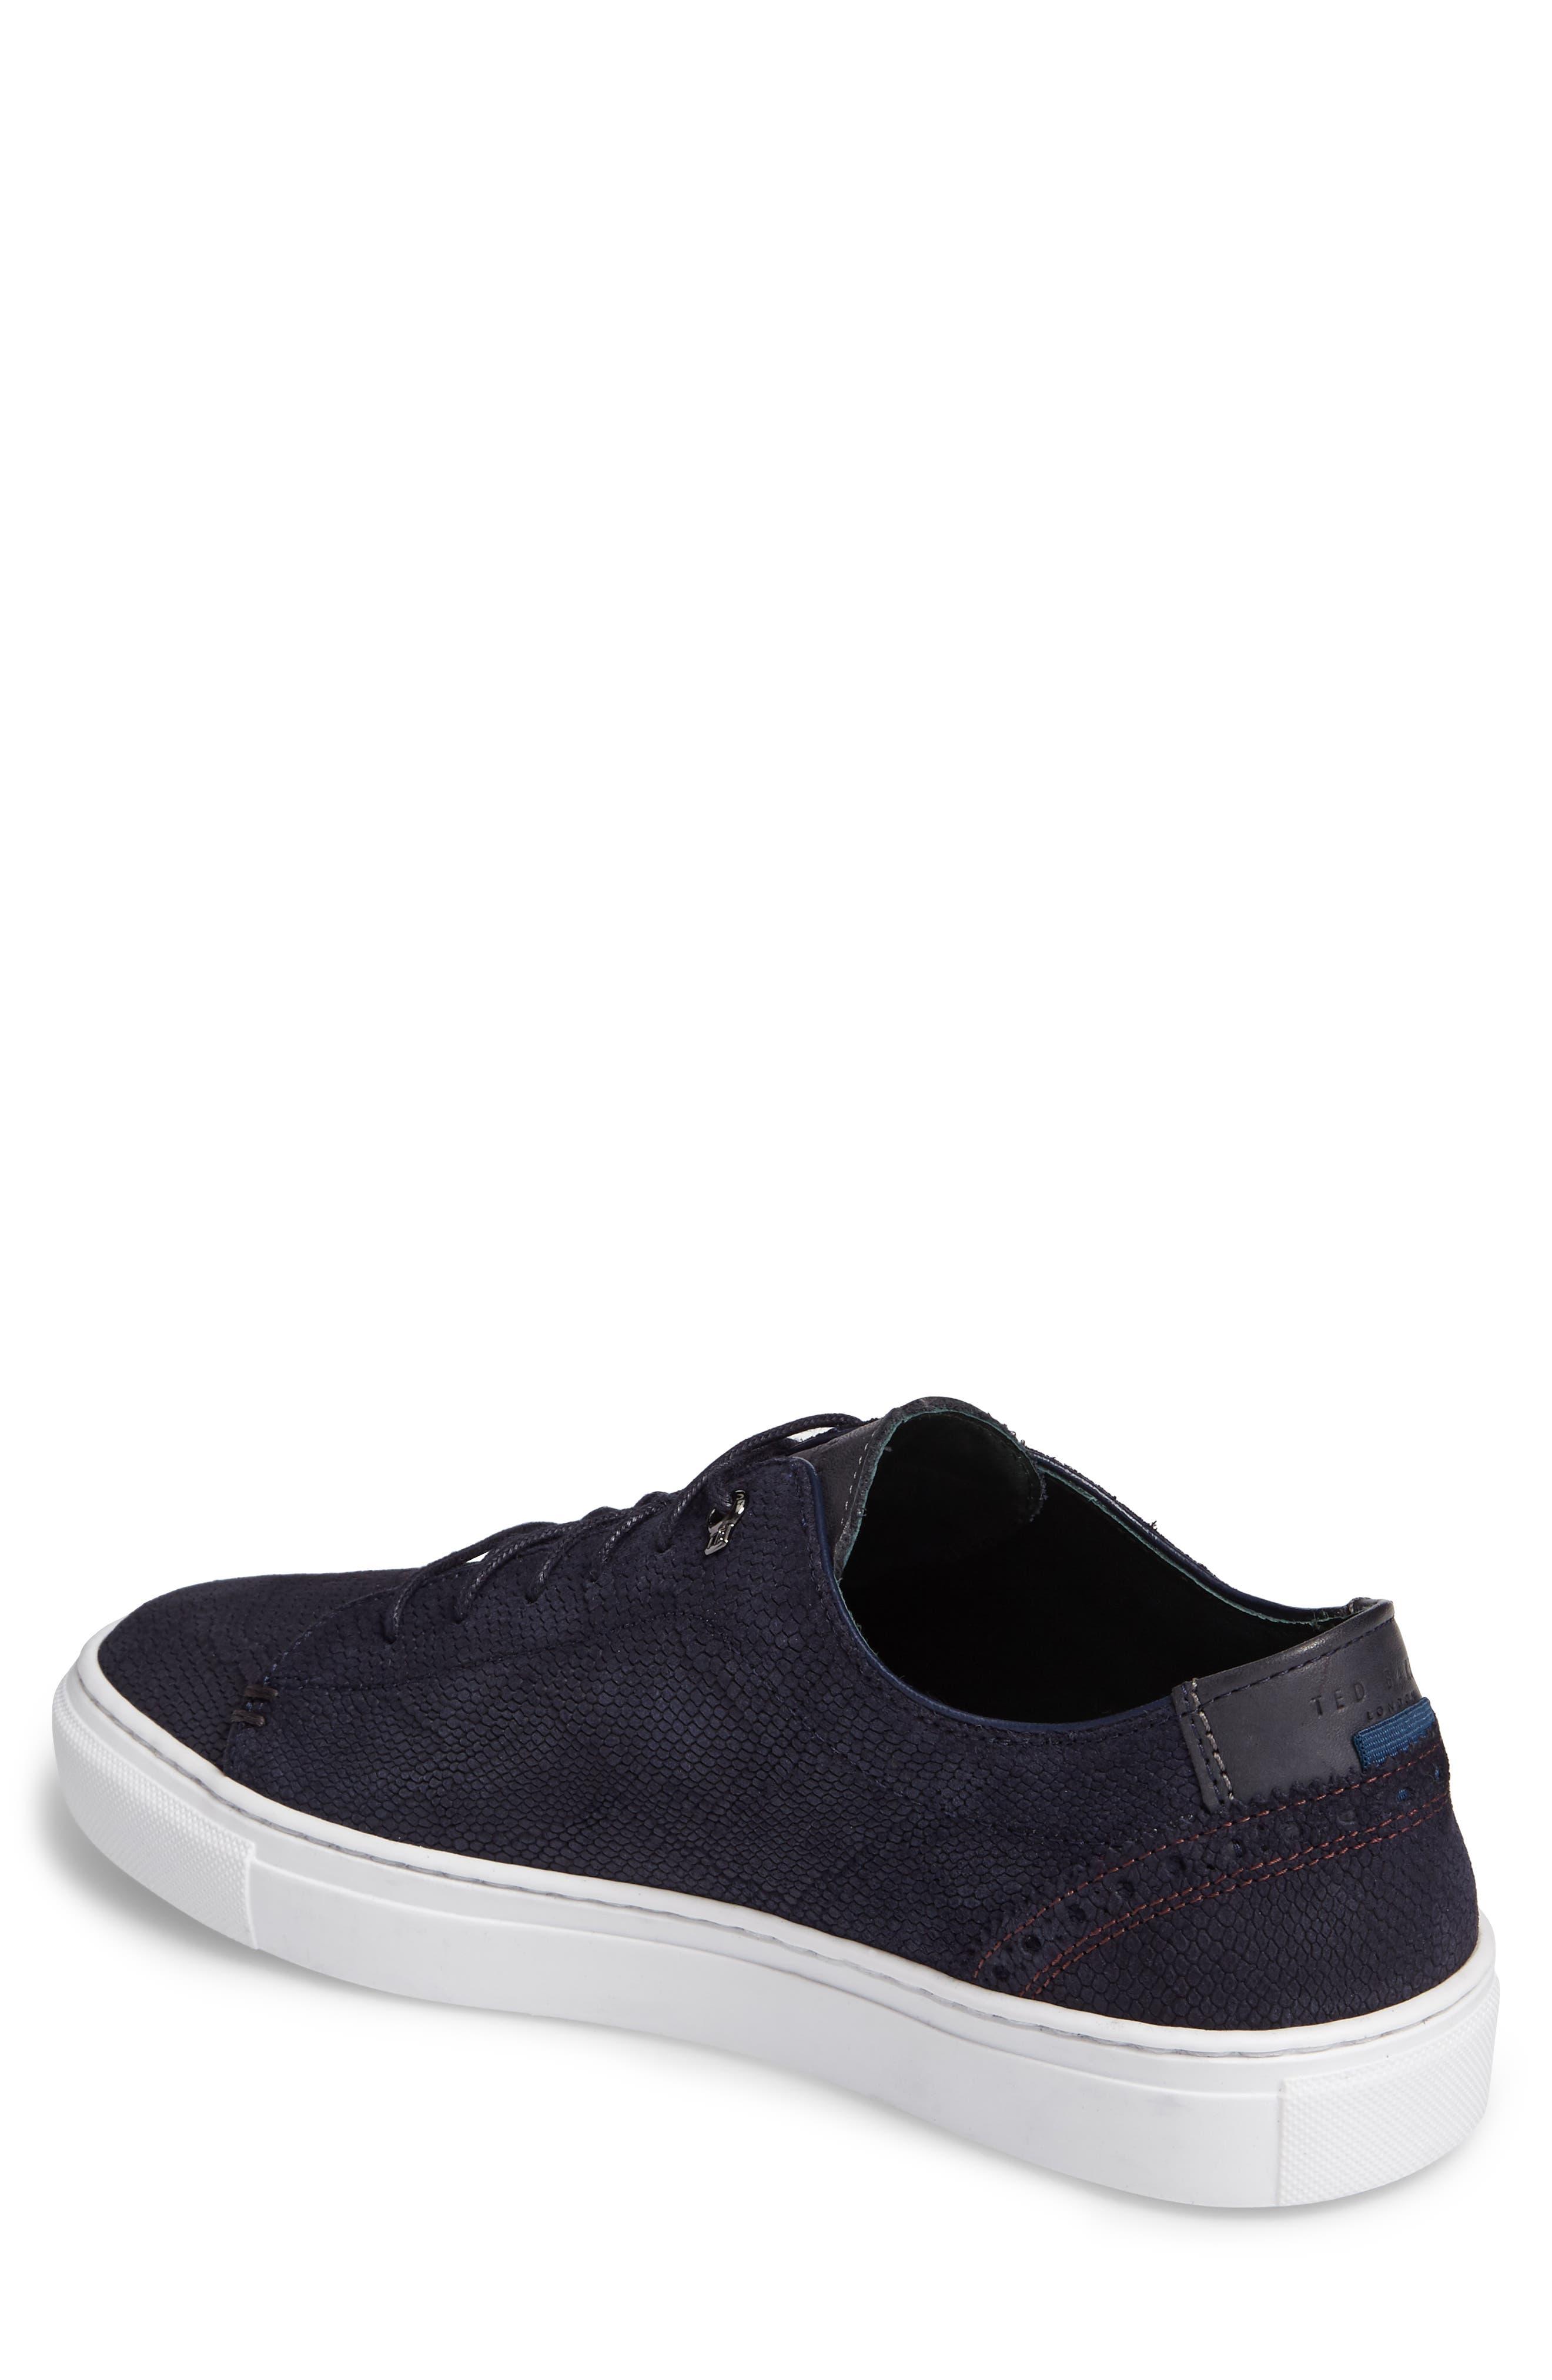 Duuke Sneaker,                             Alternate thumbnail 2, color,                             Dark Blue Suede